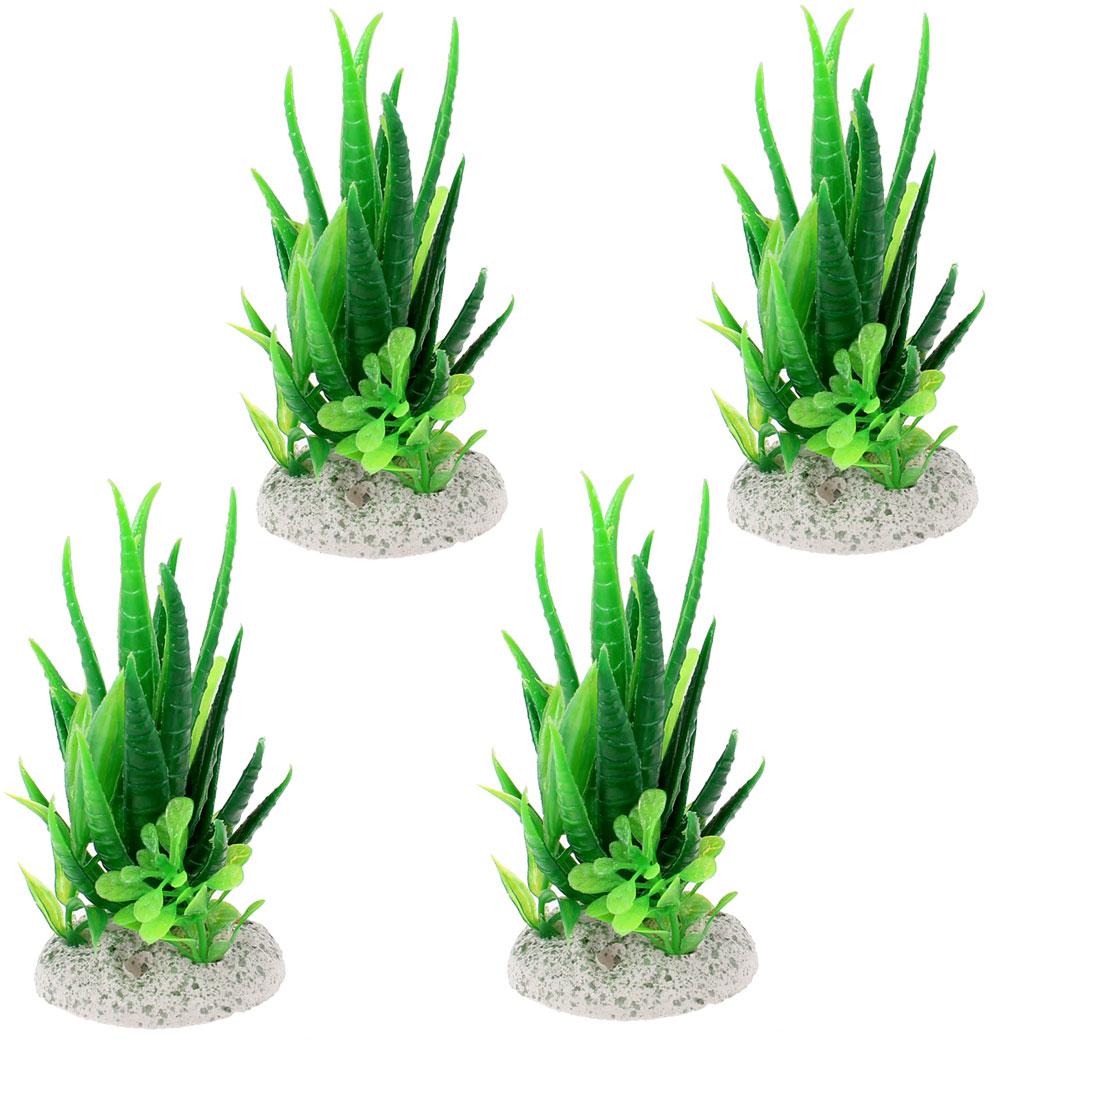 "4.5"" High Aquarium Fish Tank Ornament Green Plastic Water Plant Grass 4 Pcs"